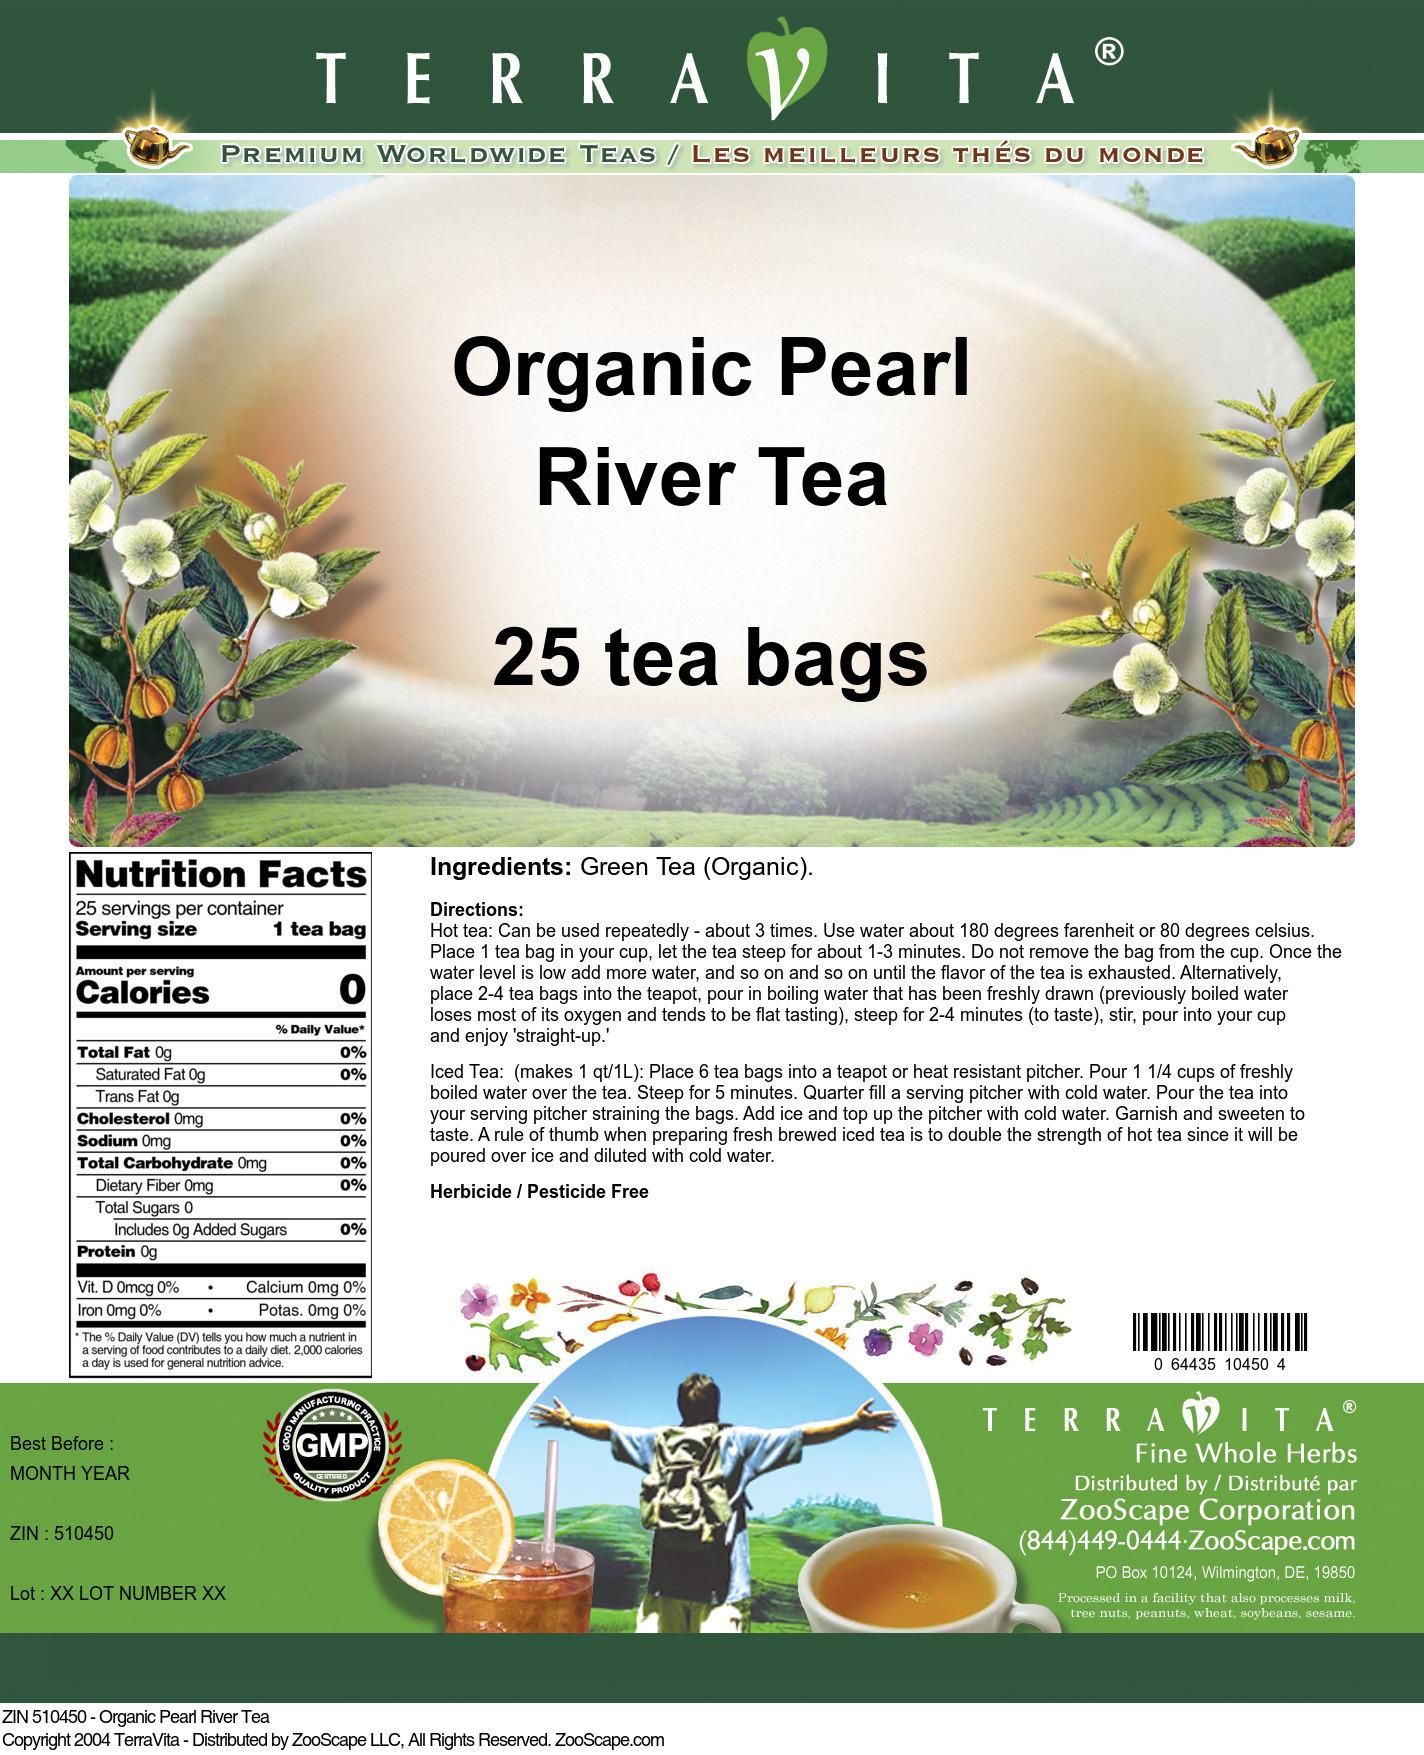 Organic Pearl River